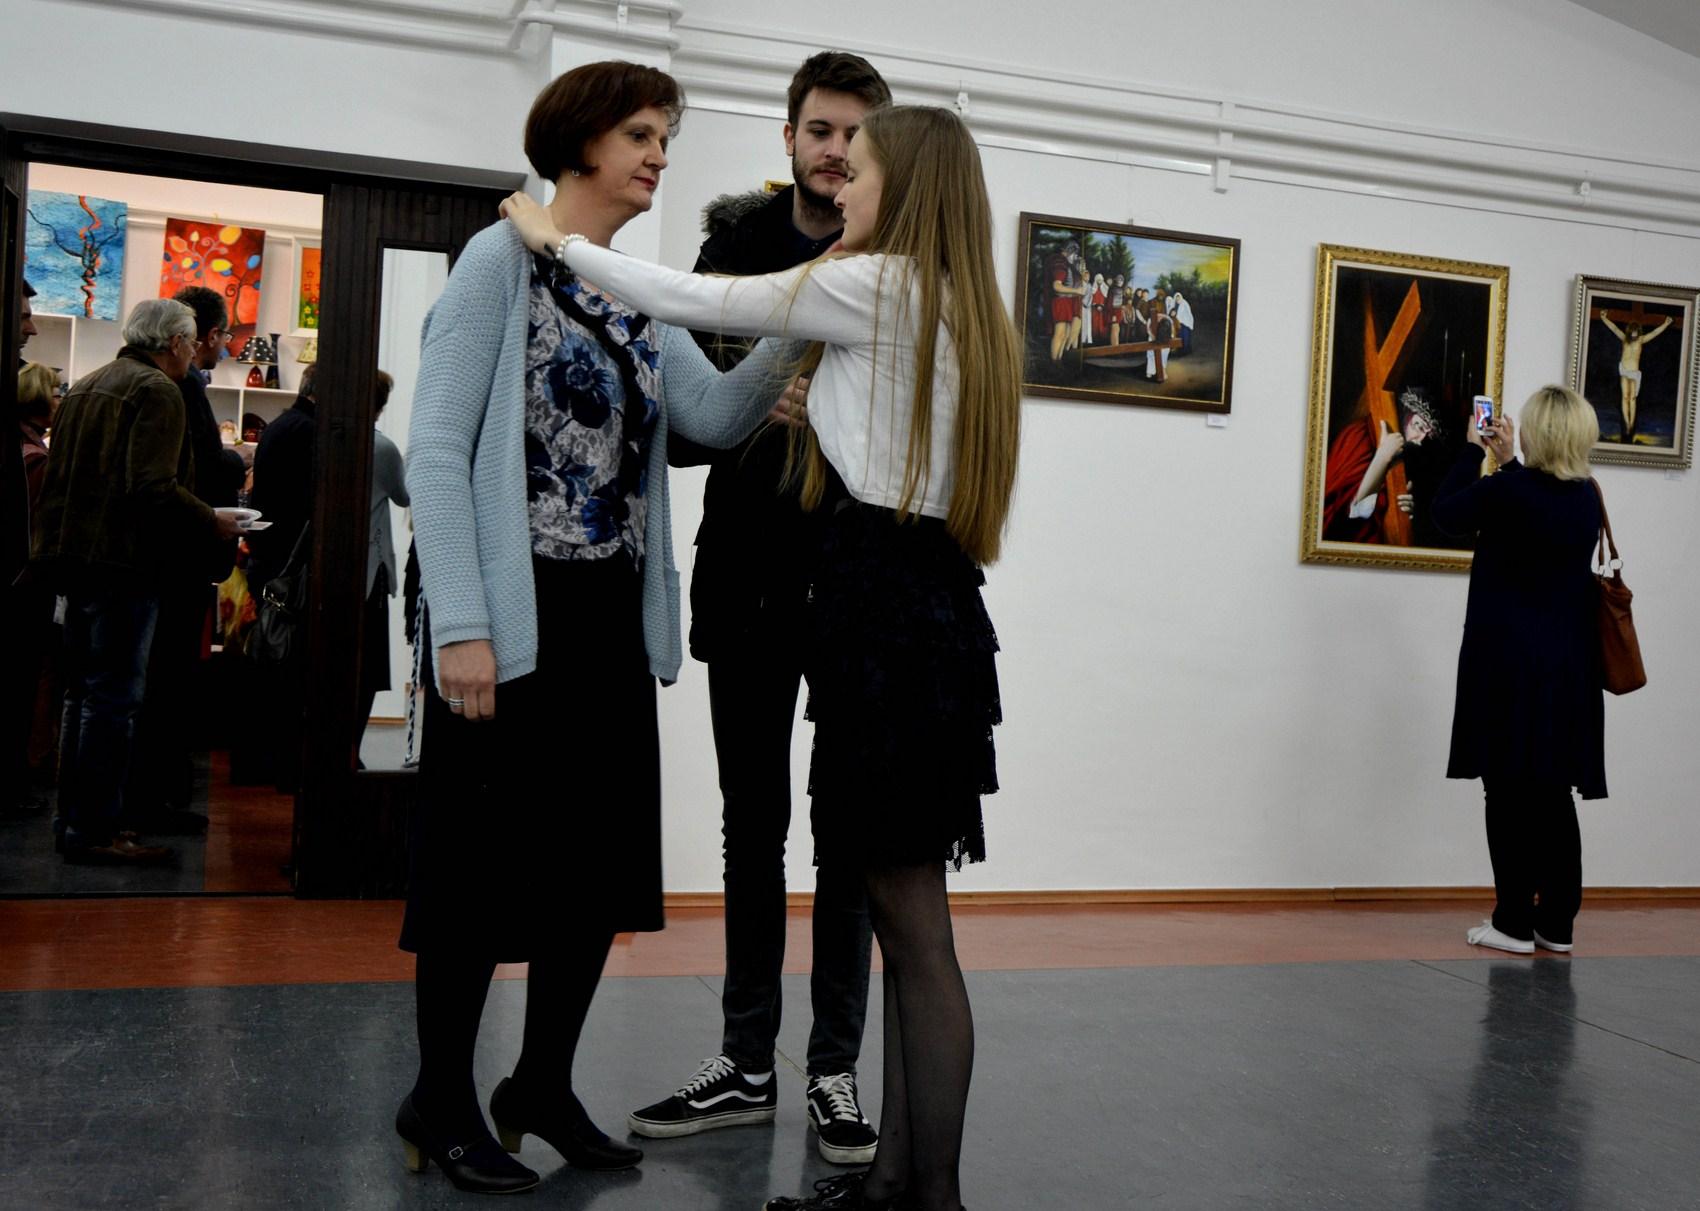 Izložba Anđelko Brkić Galerija Sunce 2017 54